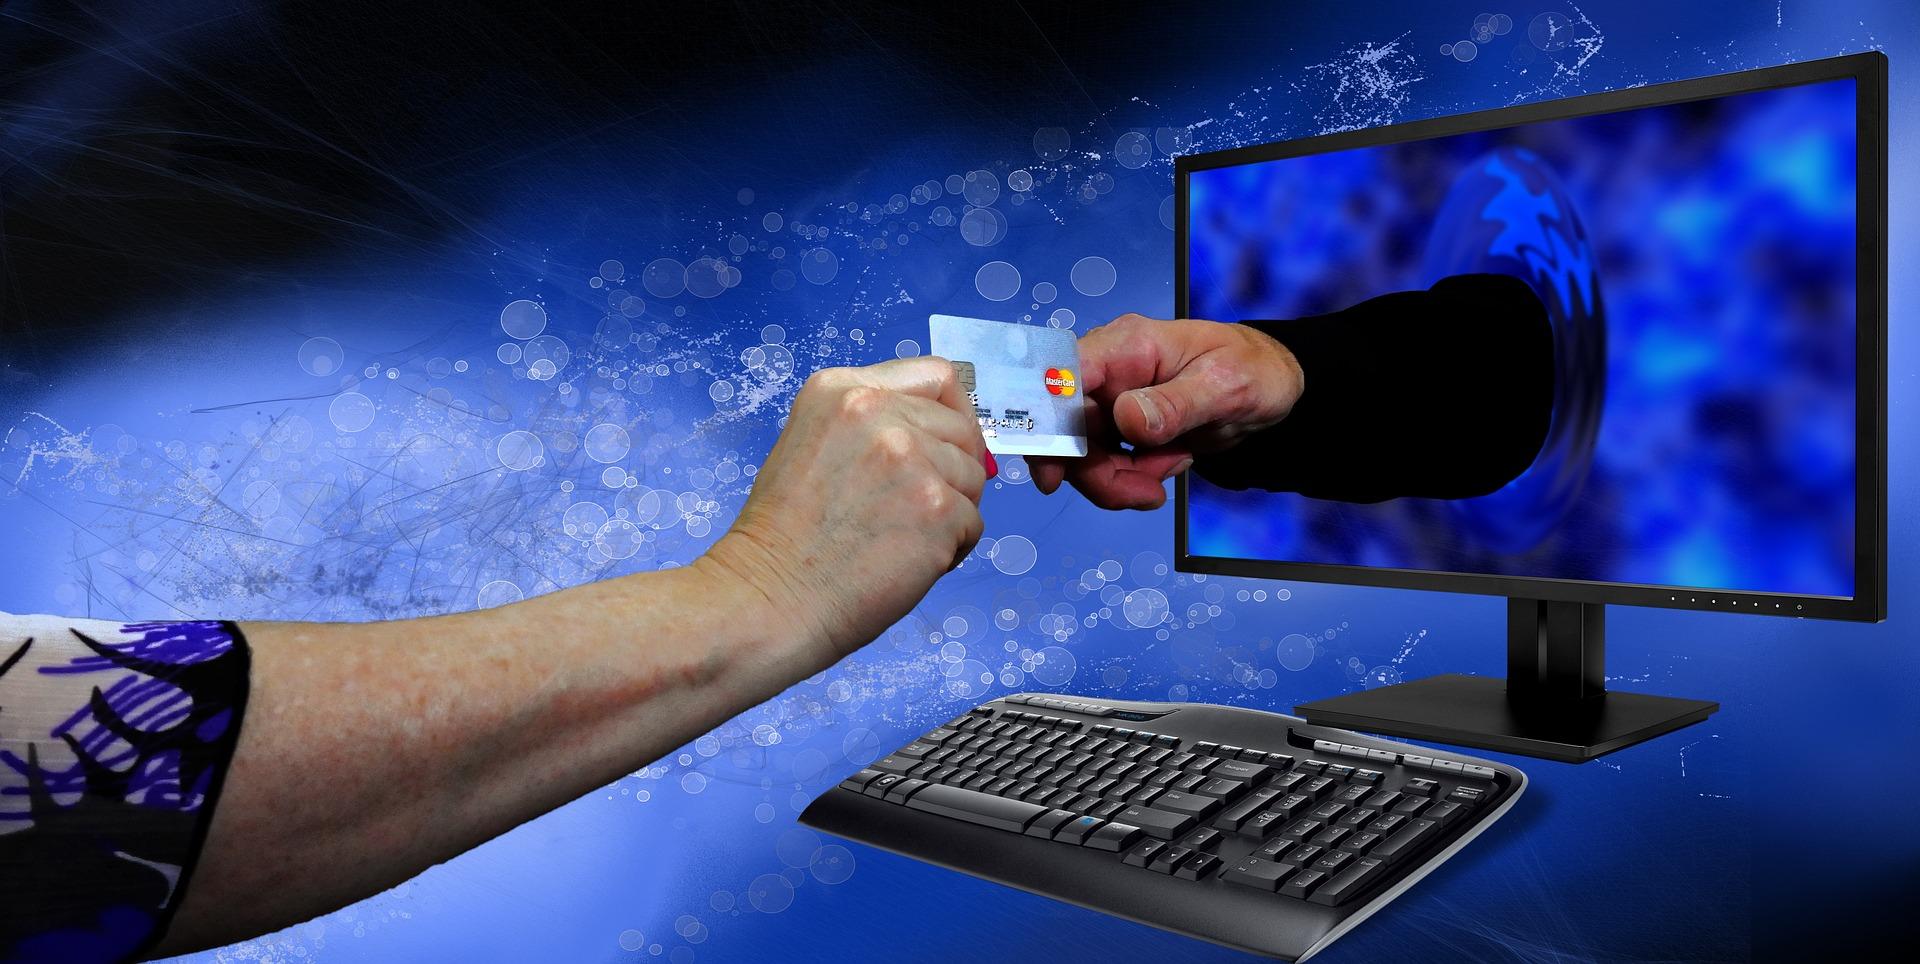 prepaid card to receive tax refund